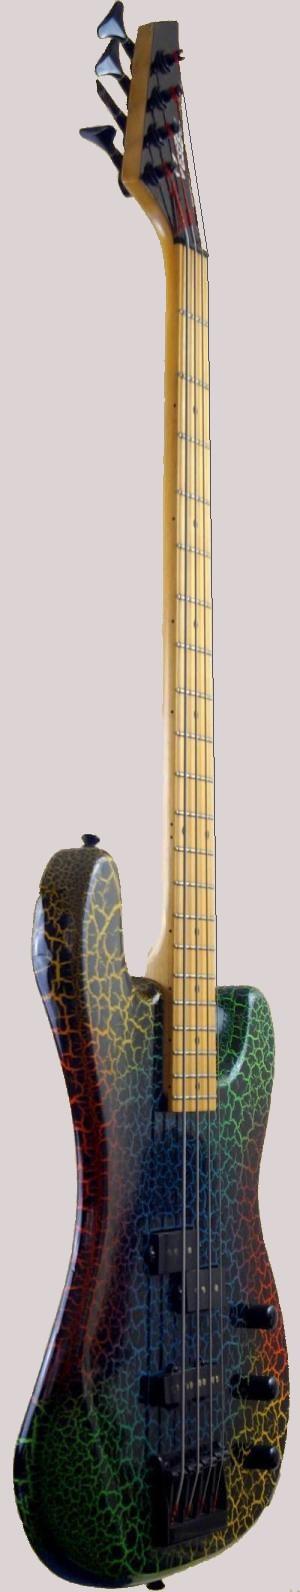 Precision copy vester bass guitar at Ukulele Corner